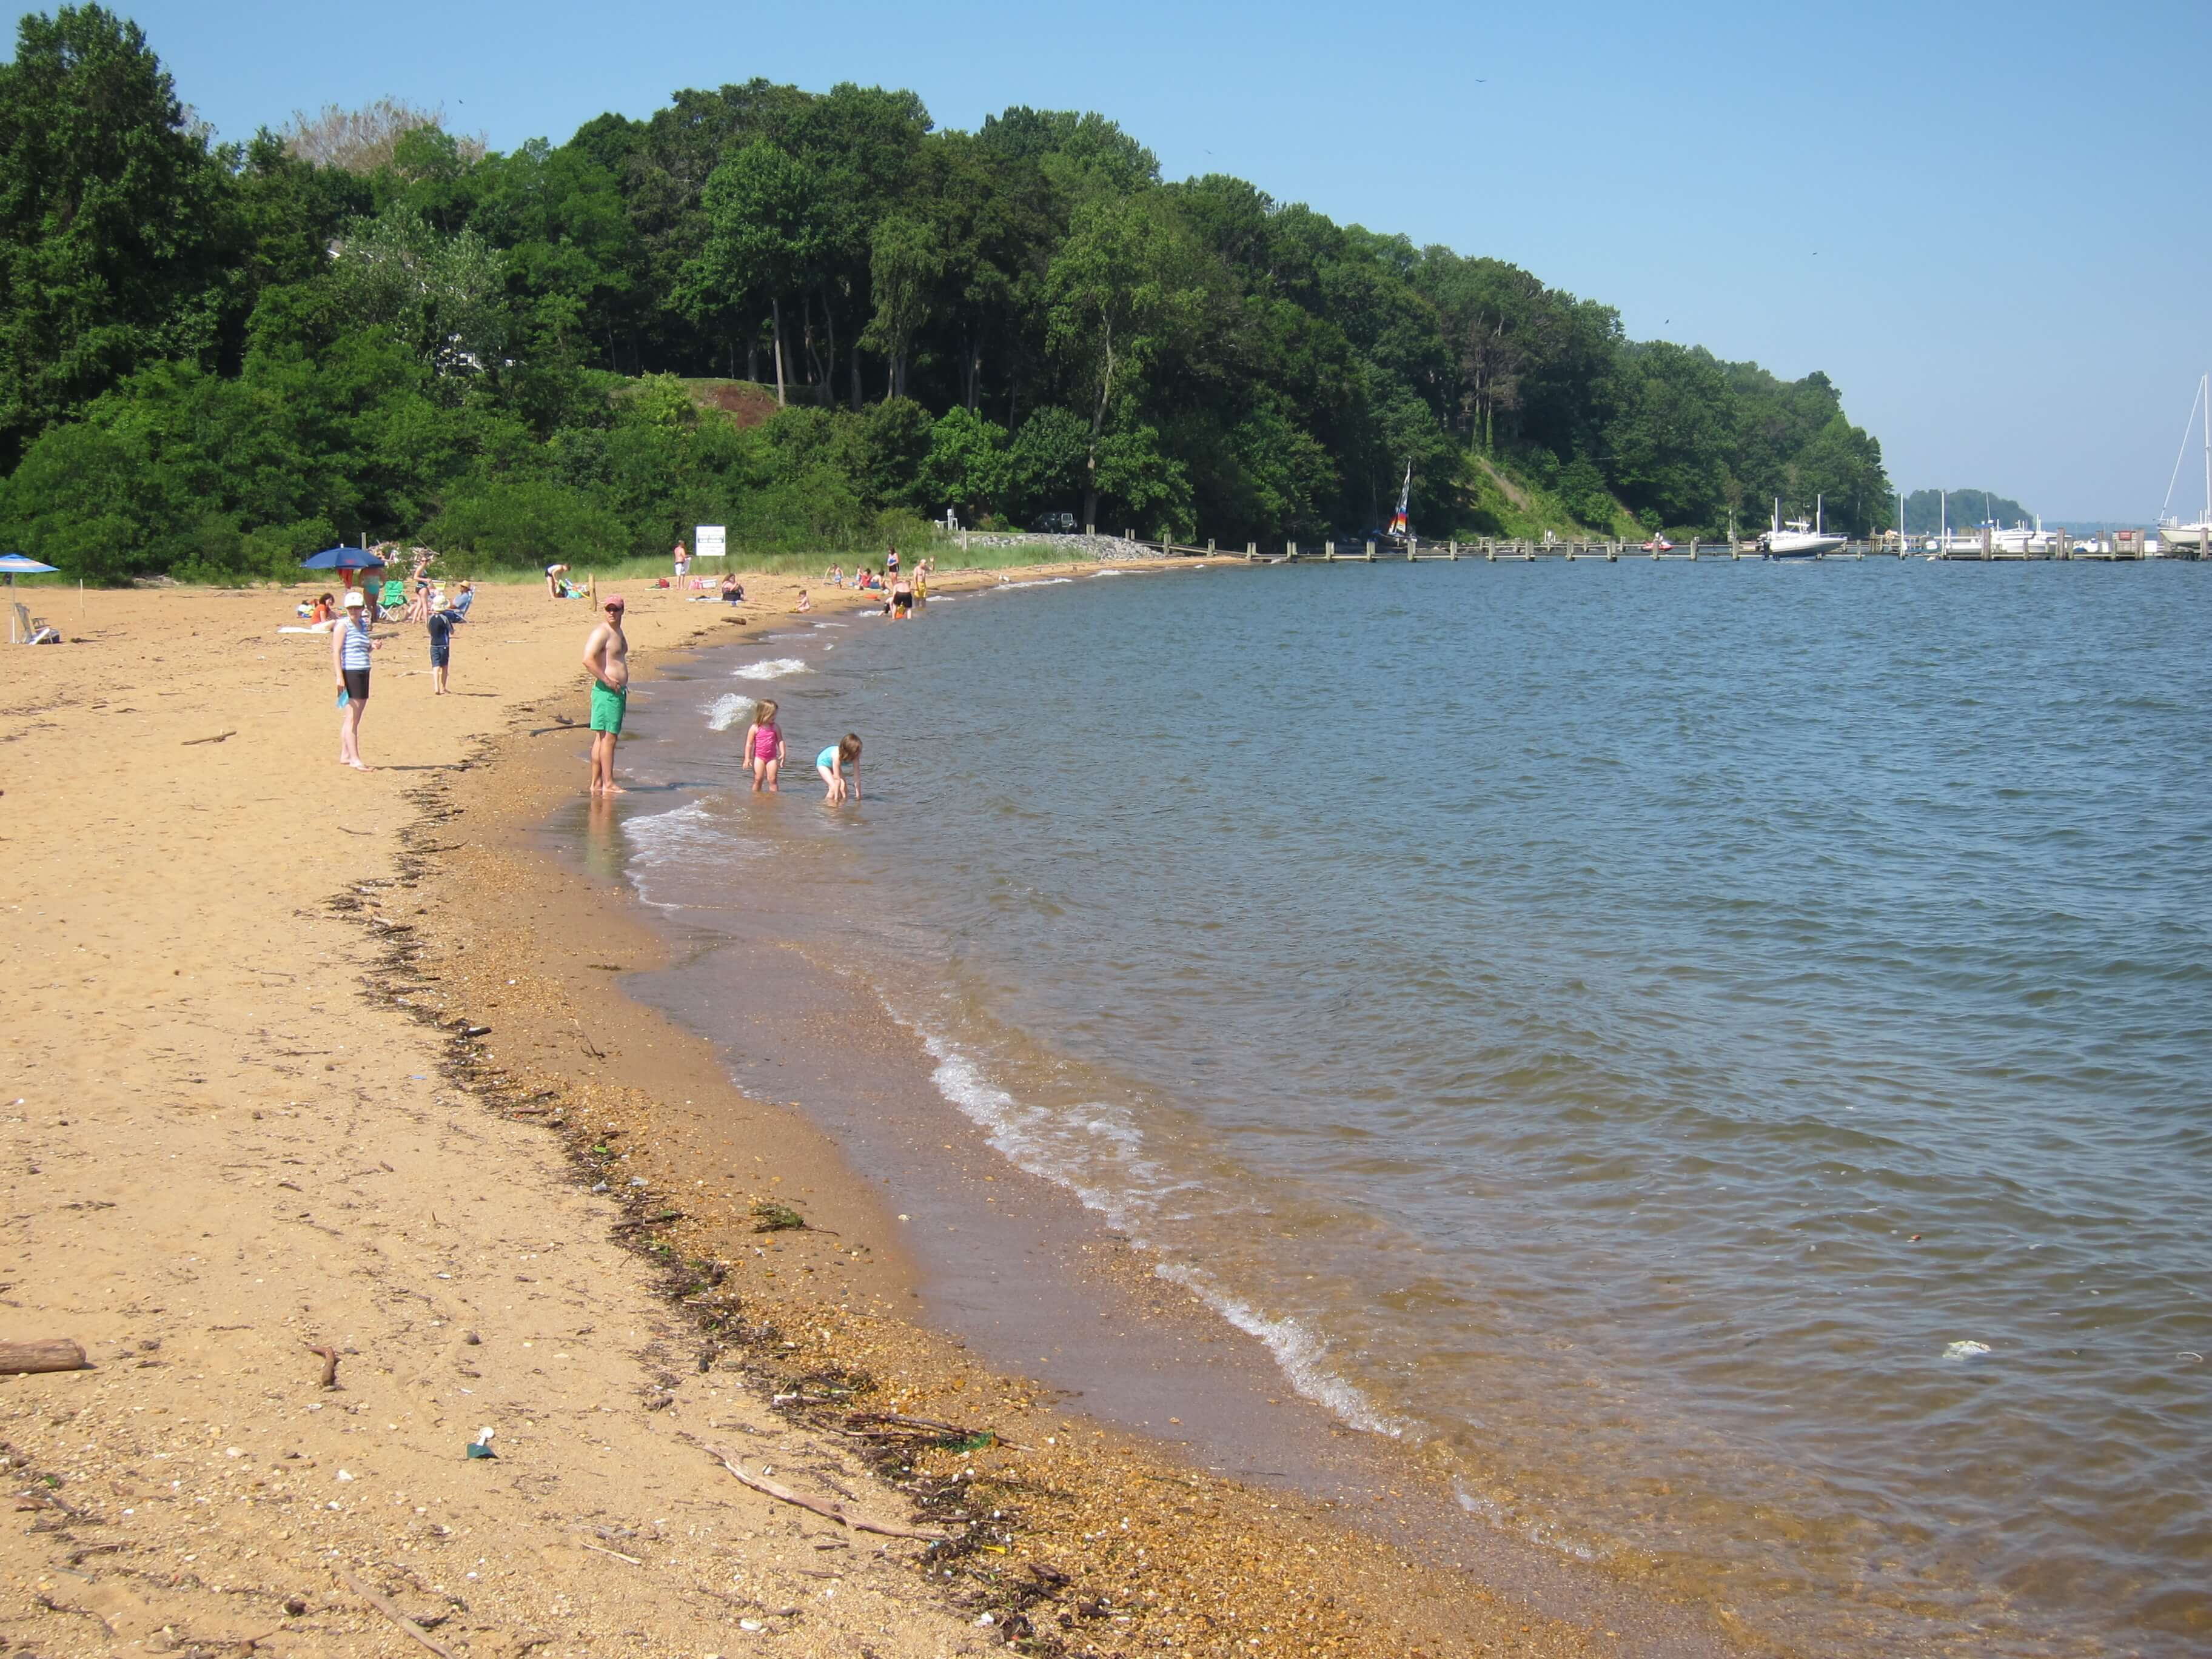 Betterton beach